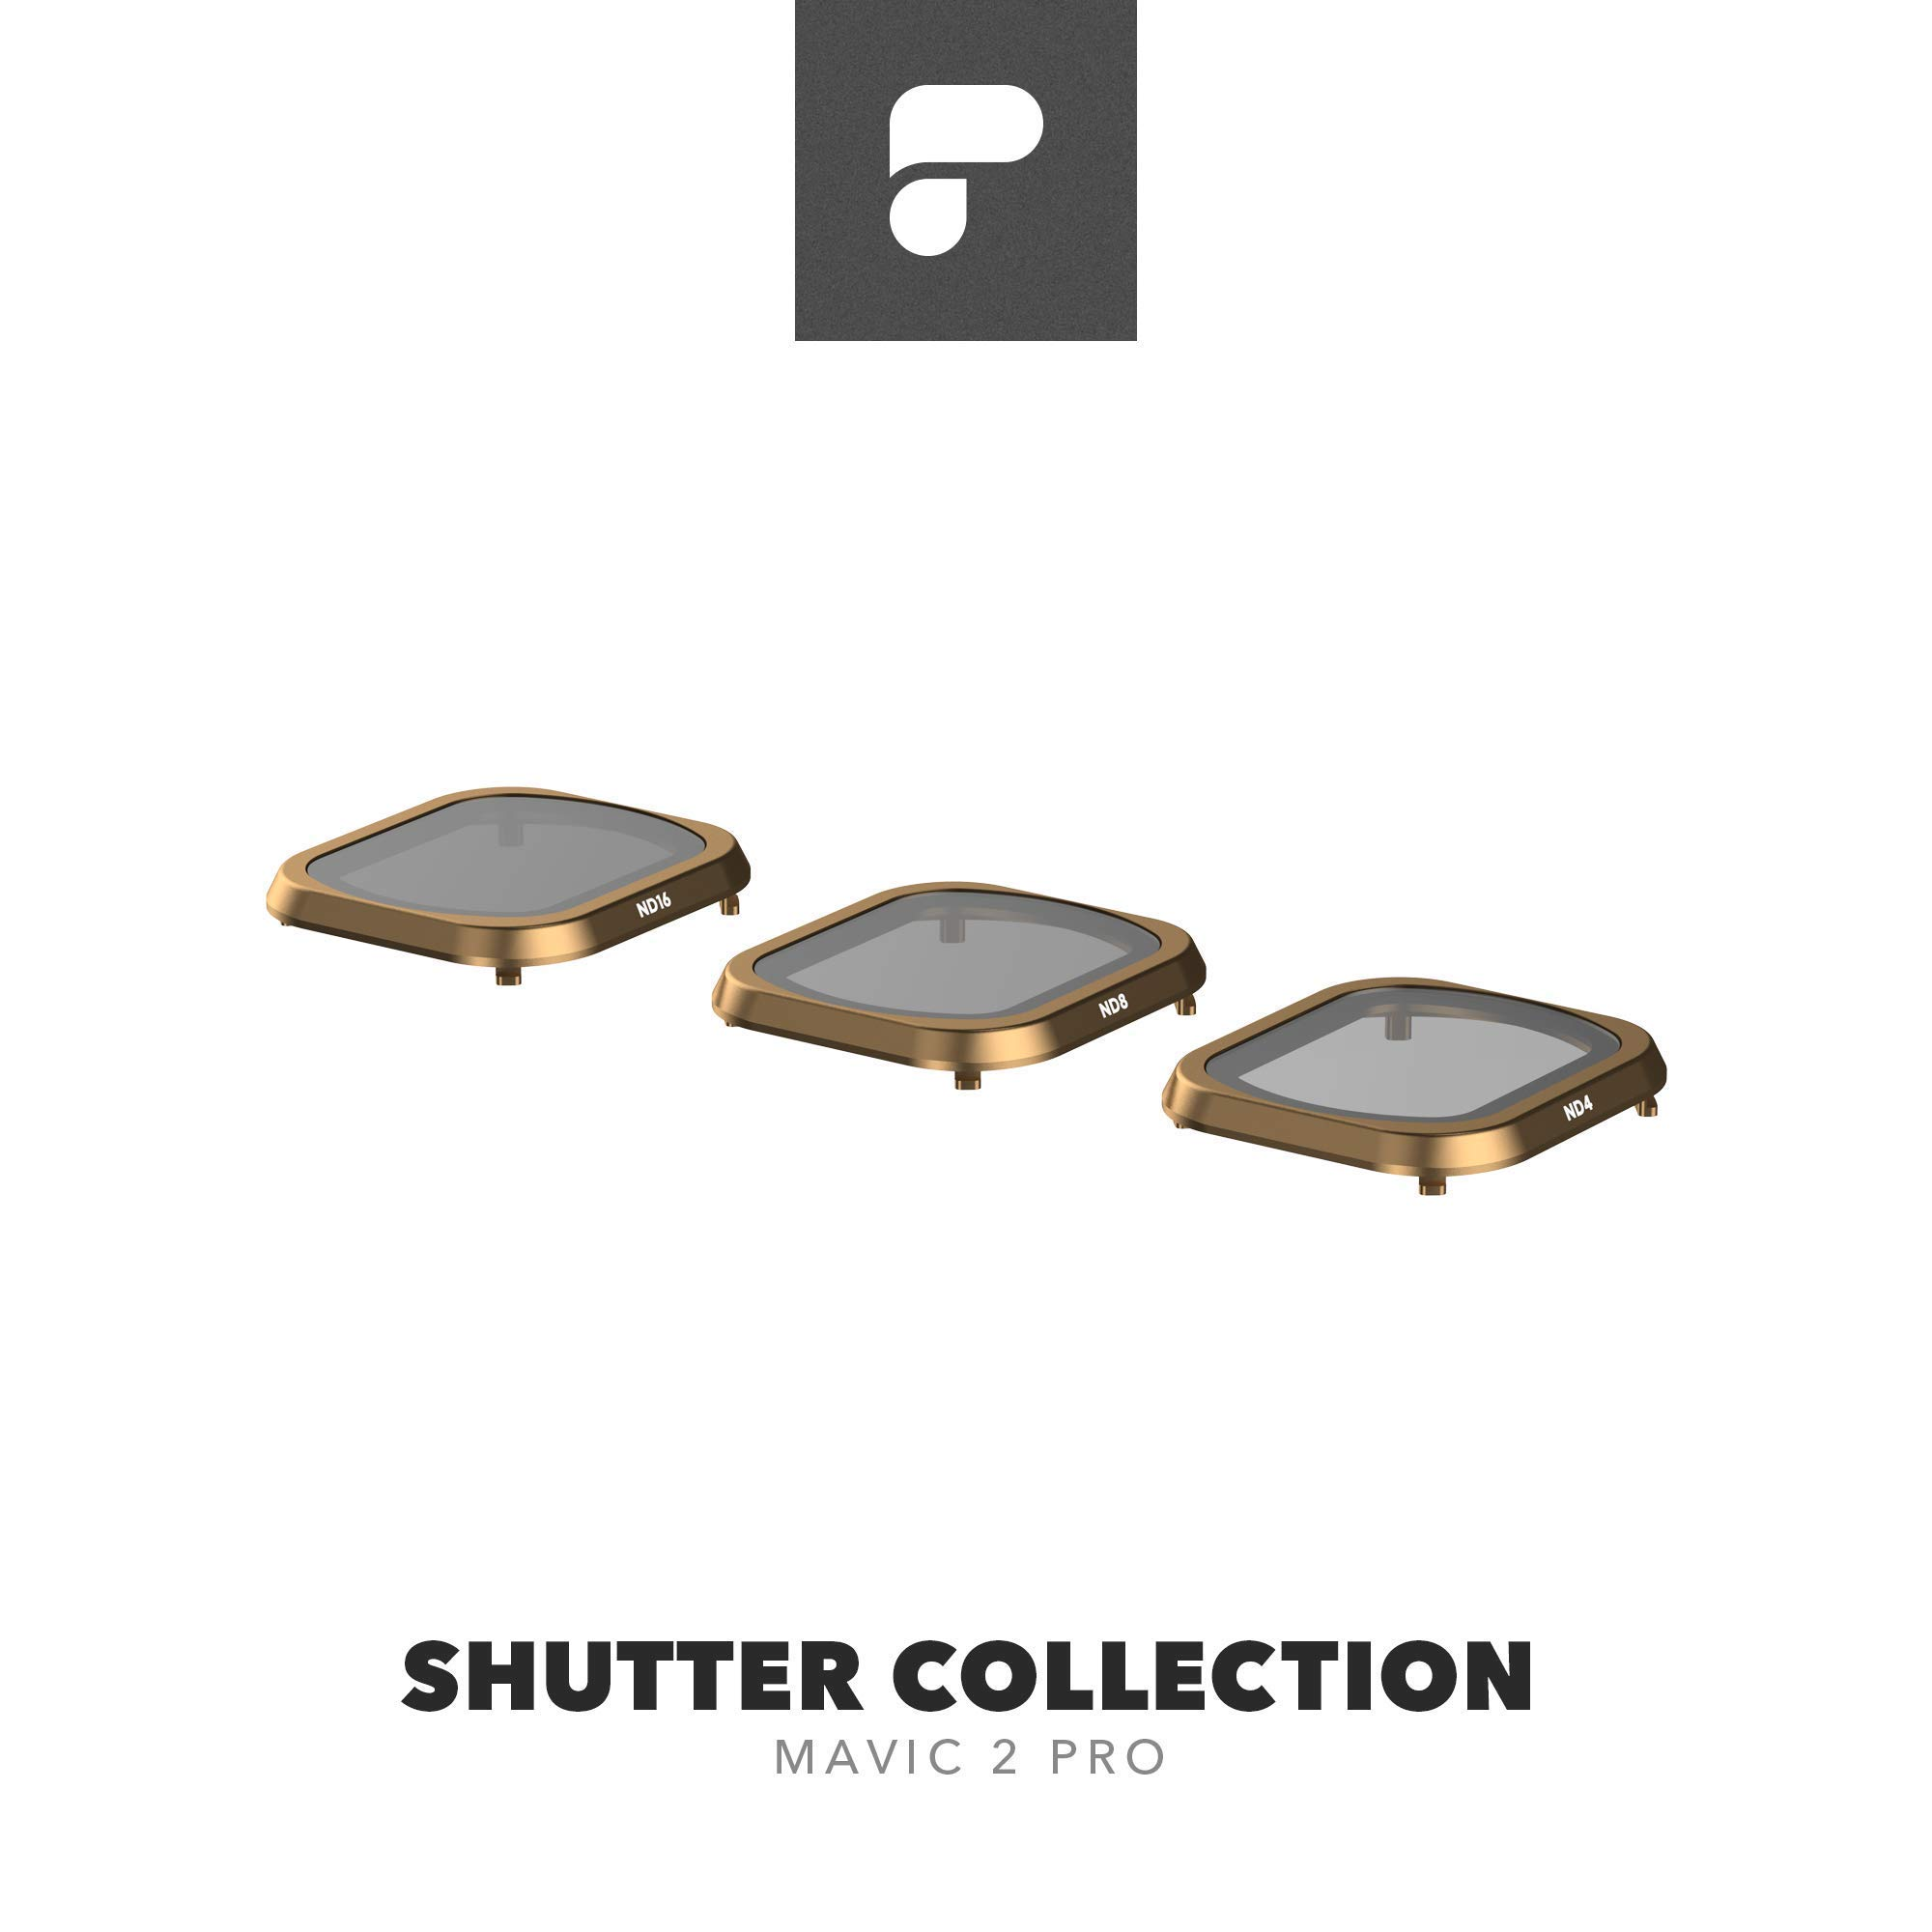 PolarPro Shutter Collection (ND4, ND8, ND16 Mavic 2 Filters) for DJI Mavic 2 Pro by PolarPro